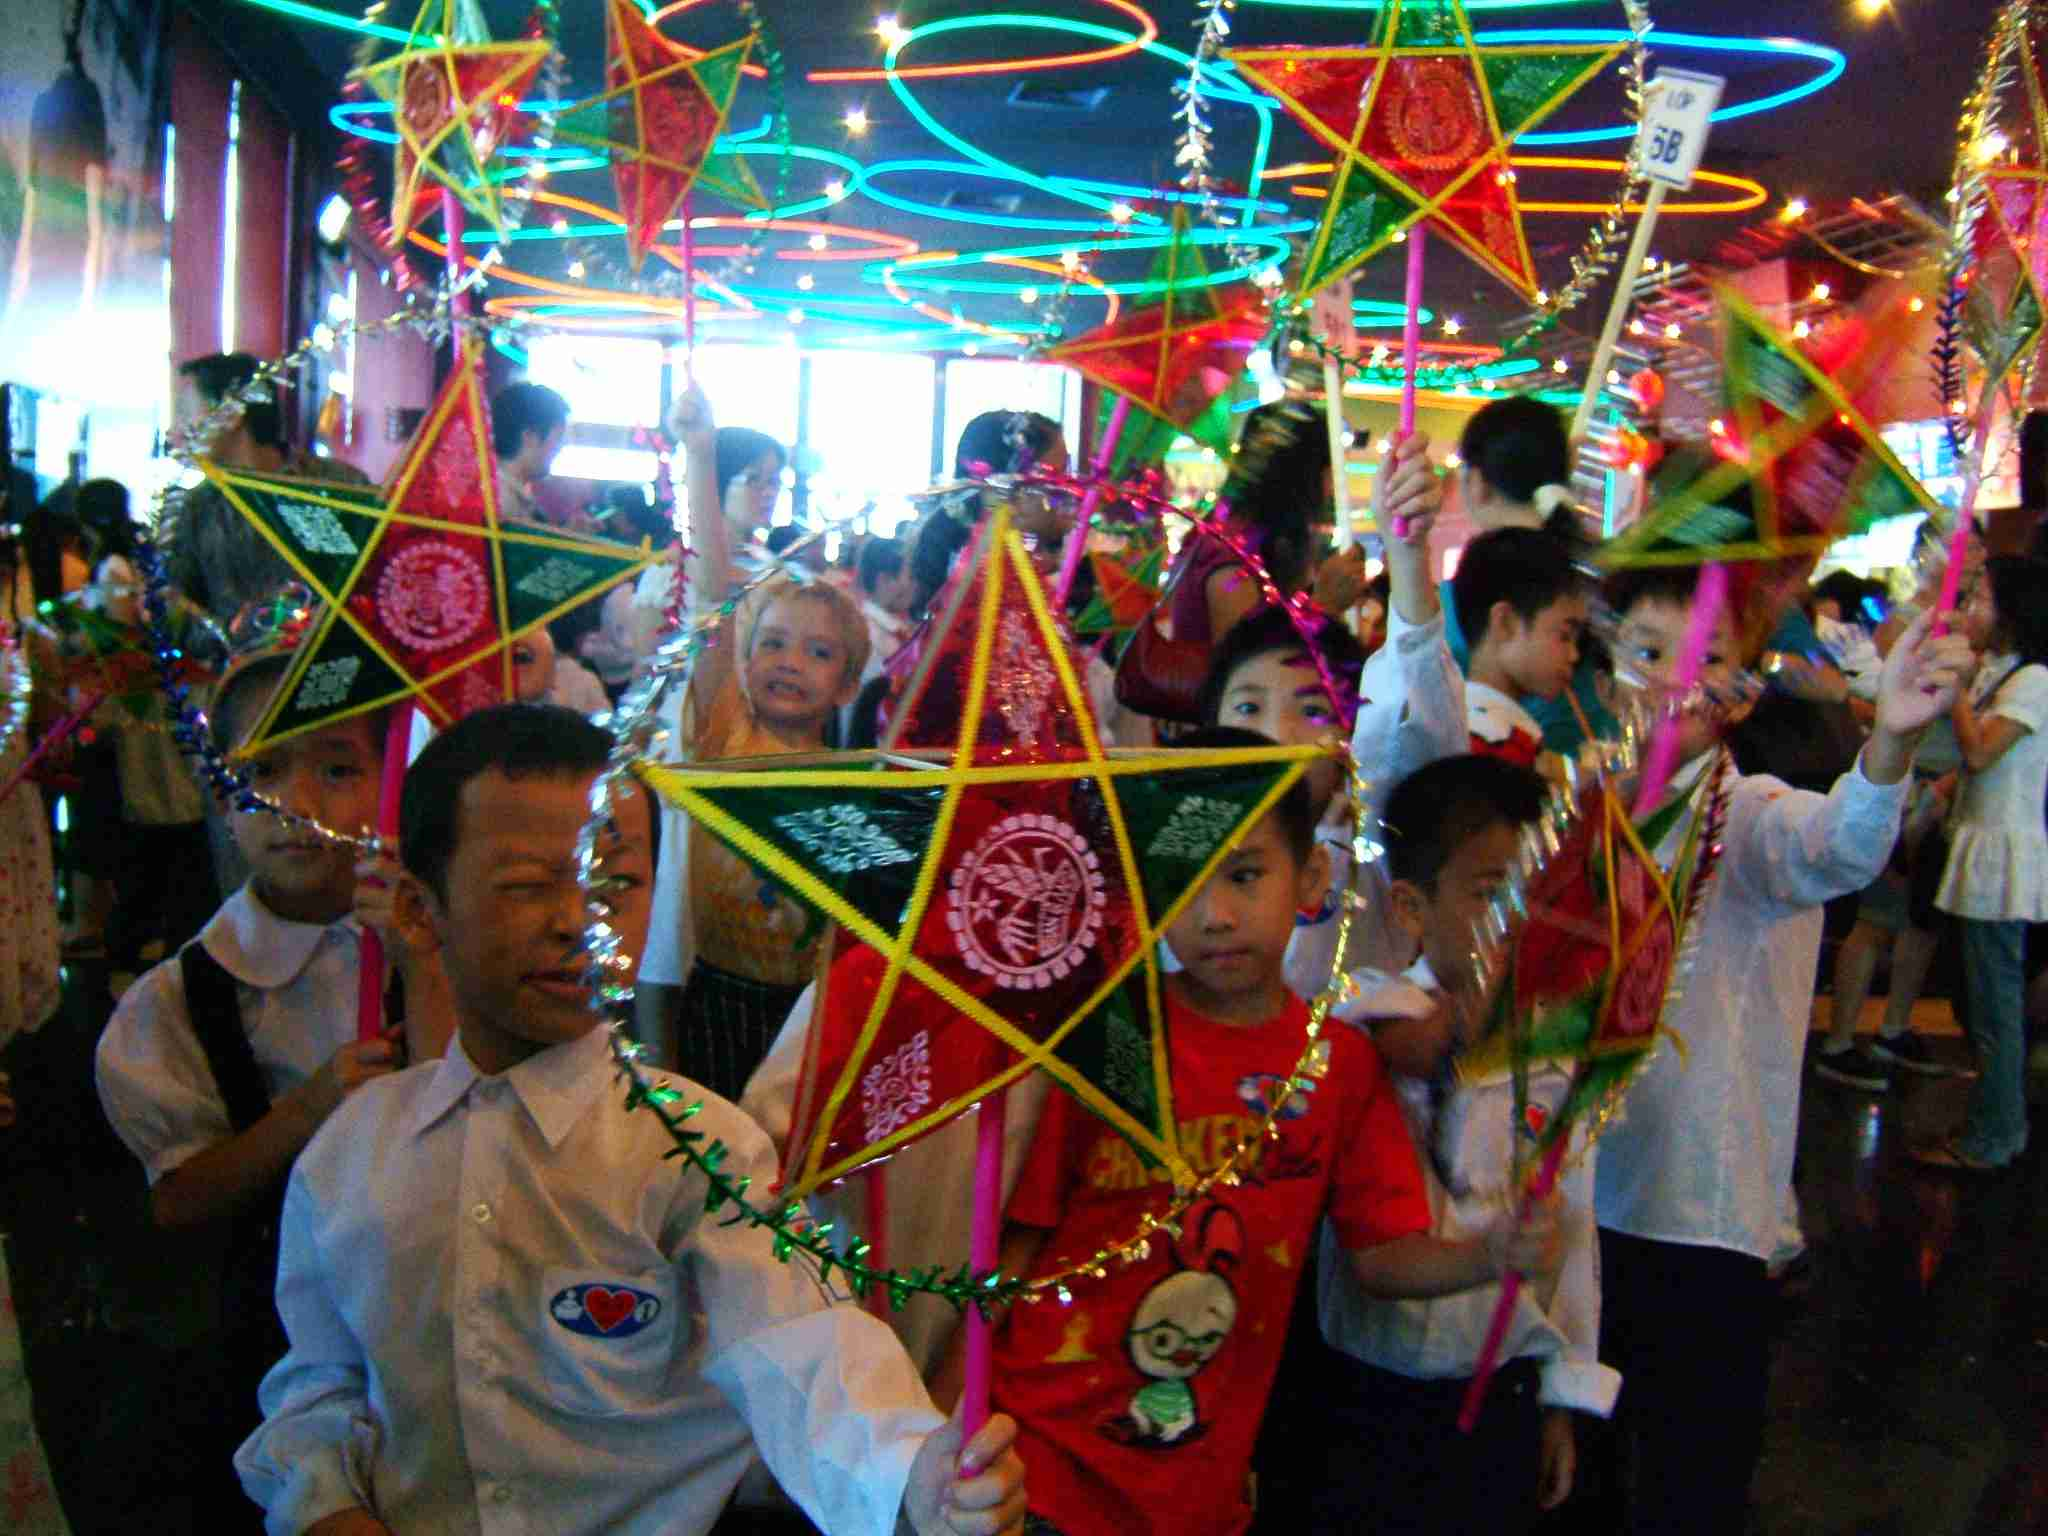 Vietnamese children celebrating Mid-Autumn Festival in a traditional lantern procession.